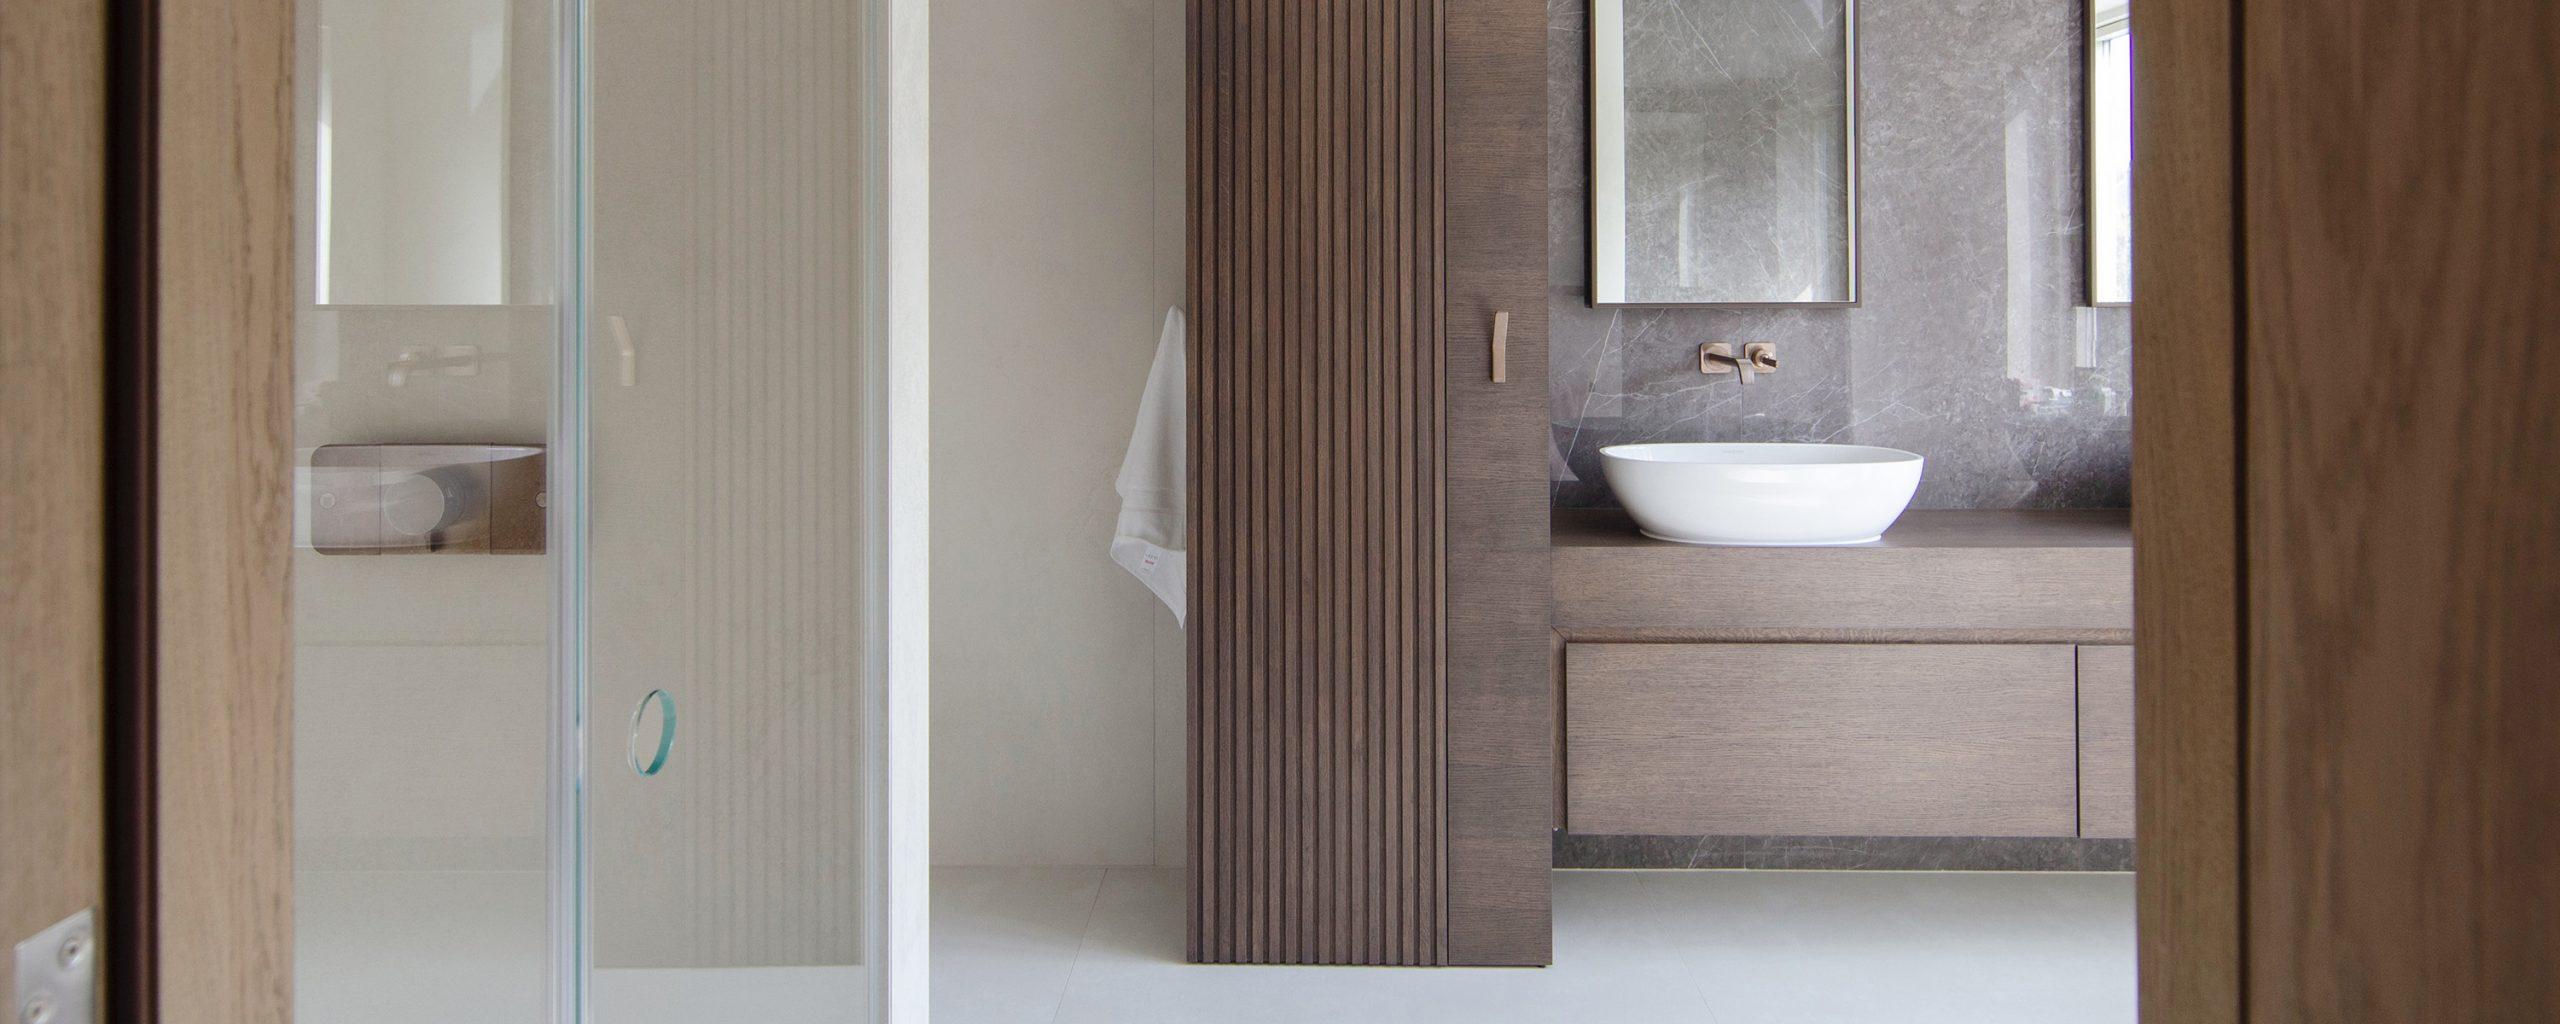 Residential interior design for spacious bathroom, Brockley, London